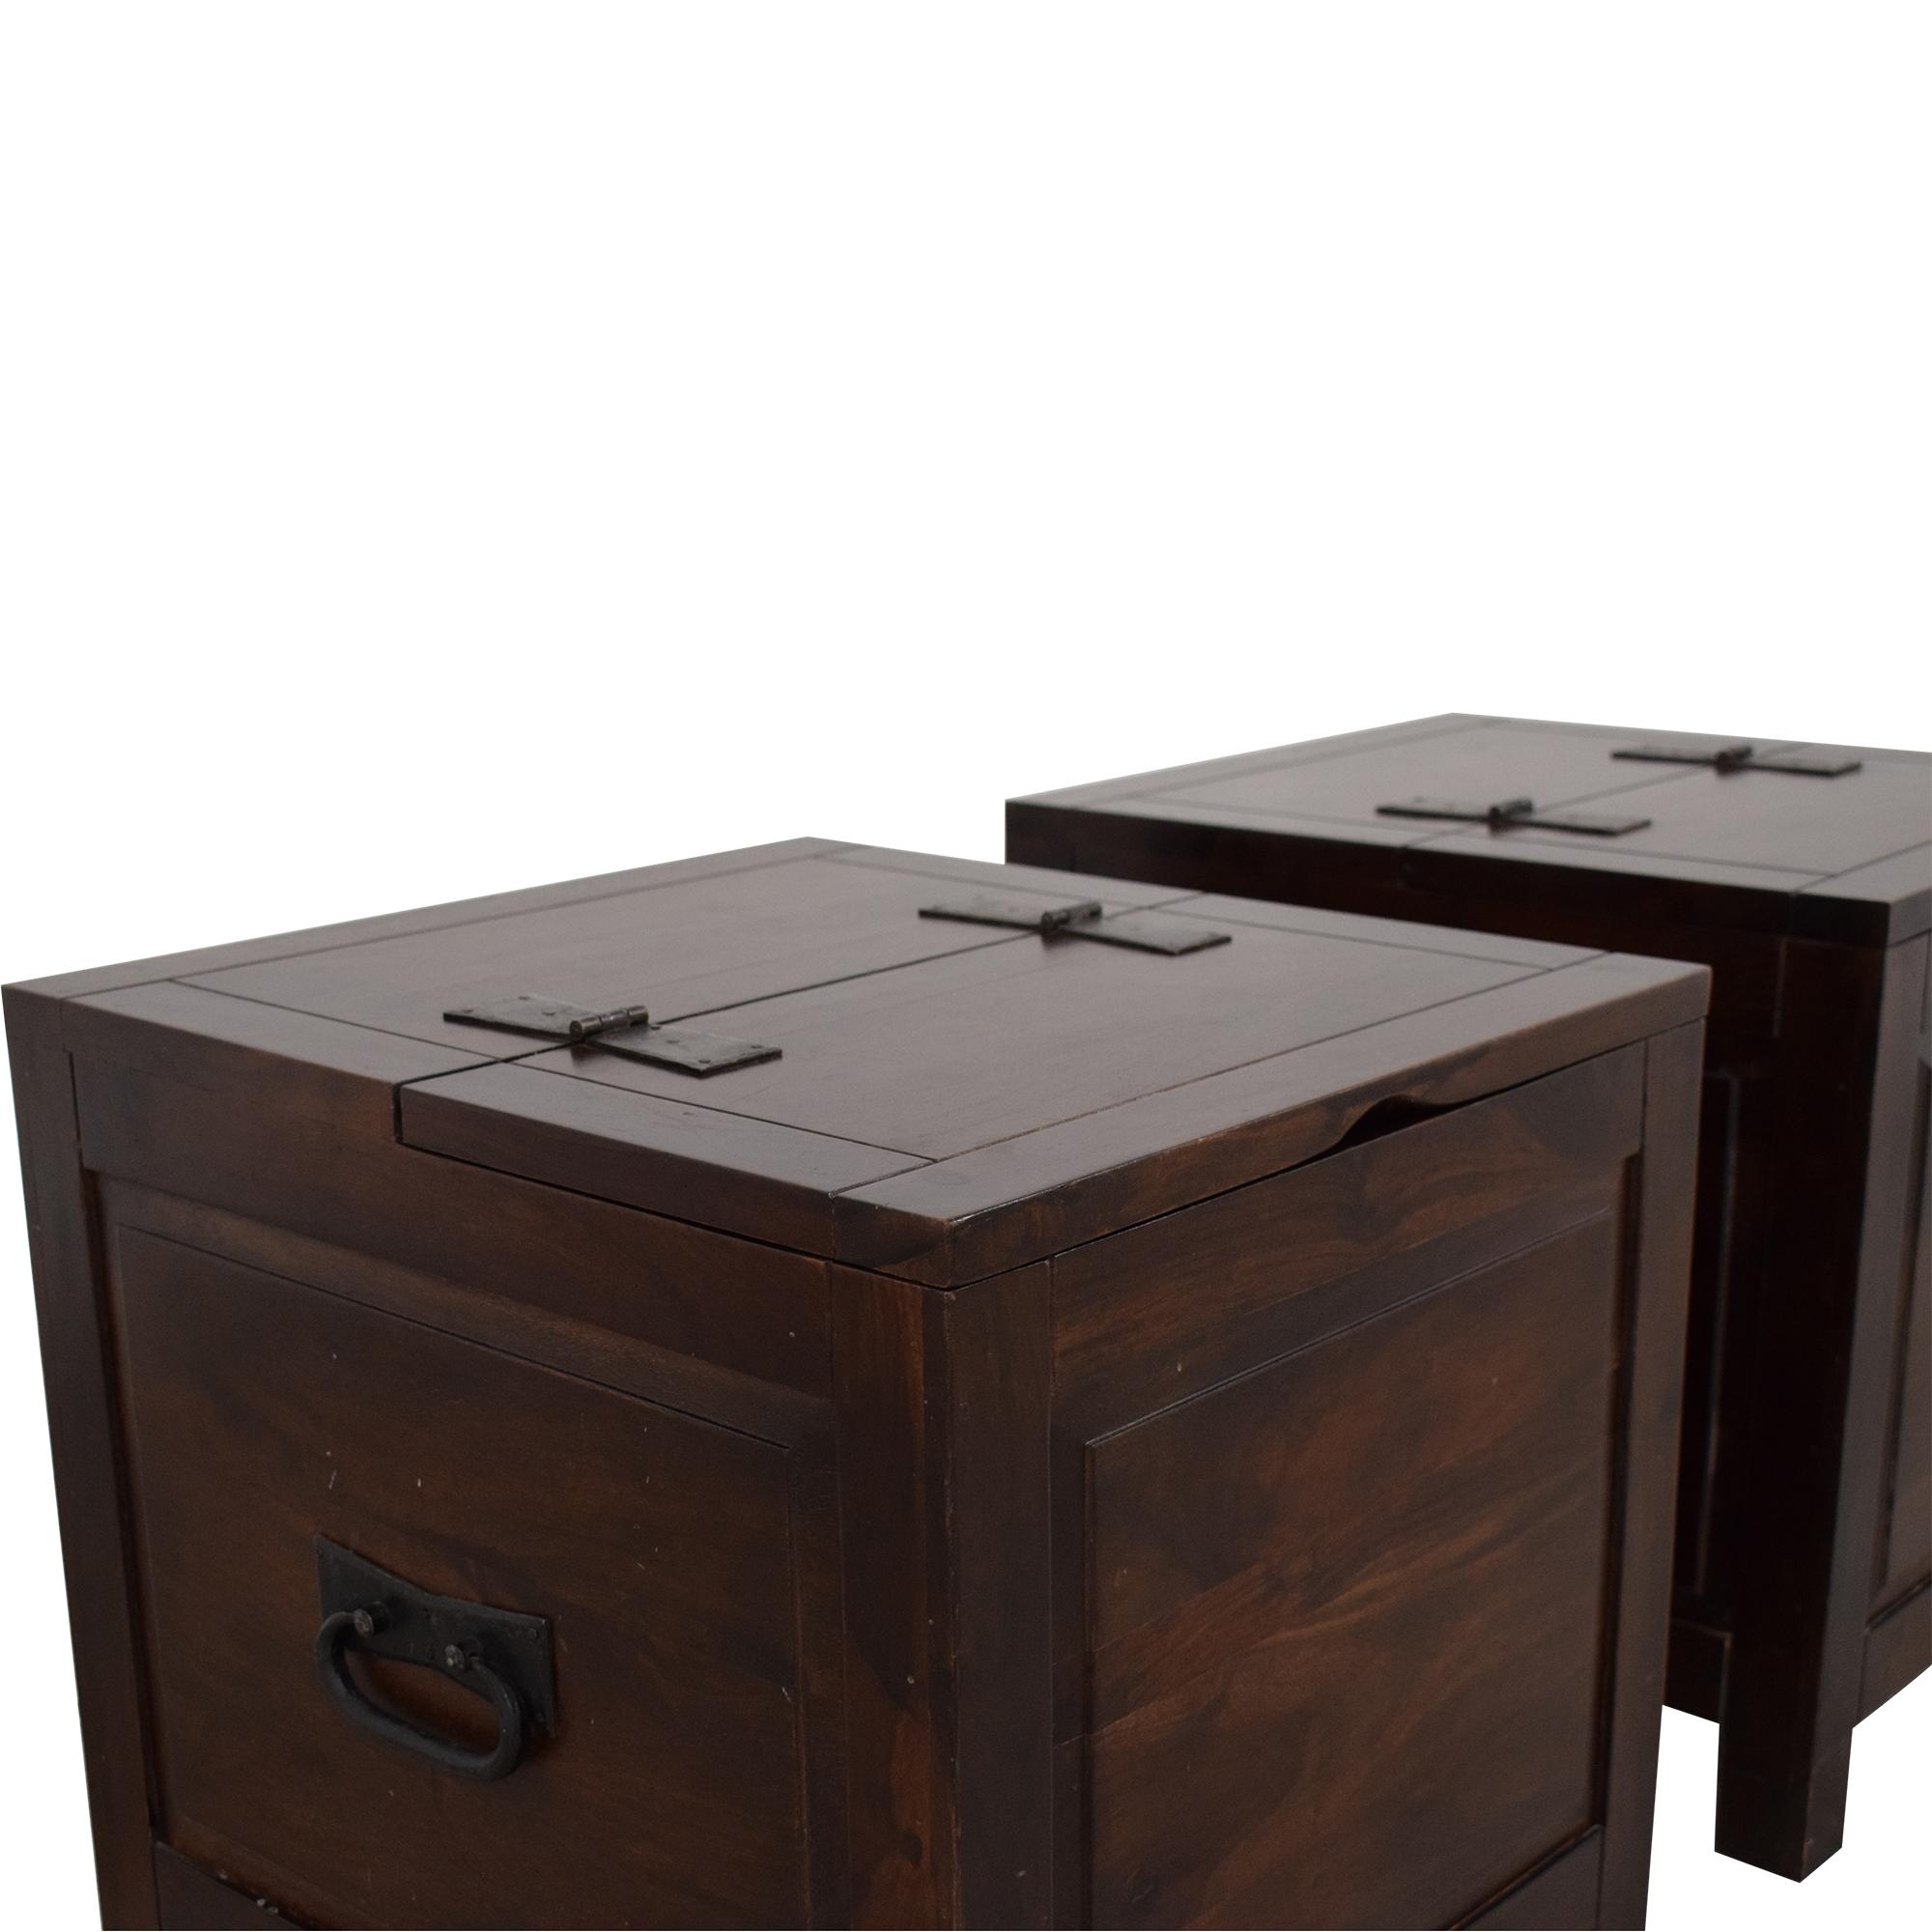 Crate & Barrel Crate & Barrel Hunter Side Trunks ma